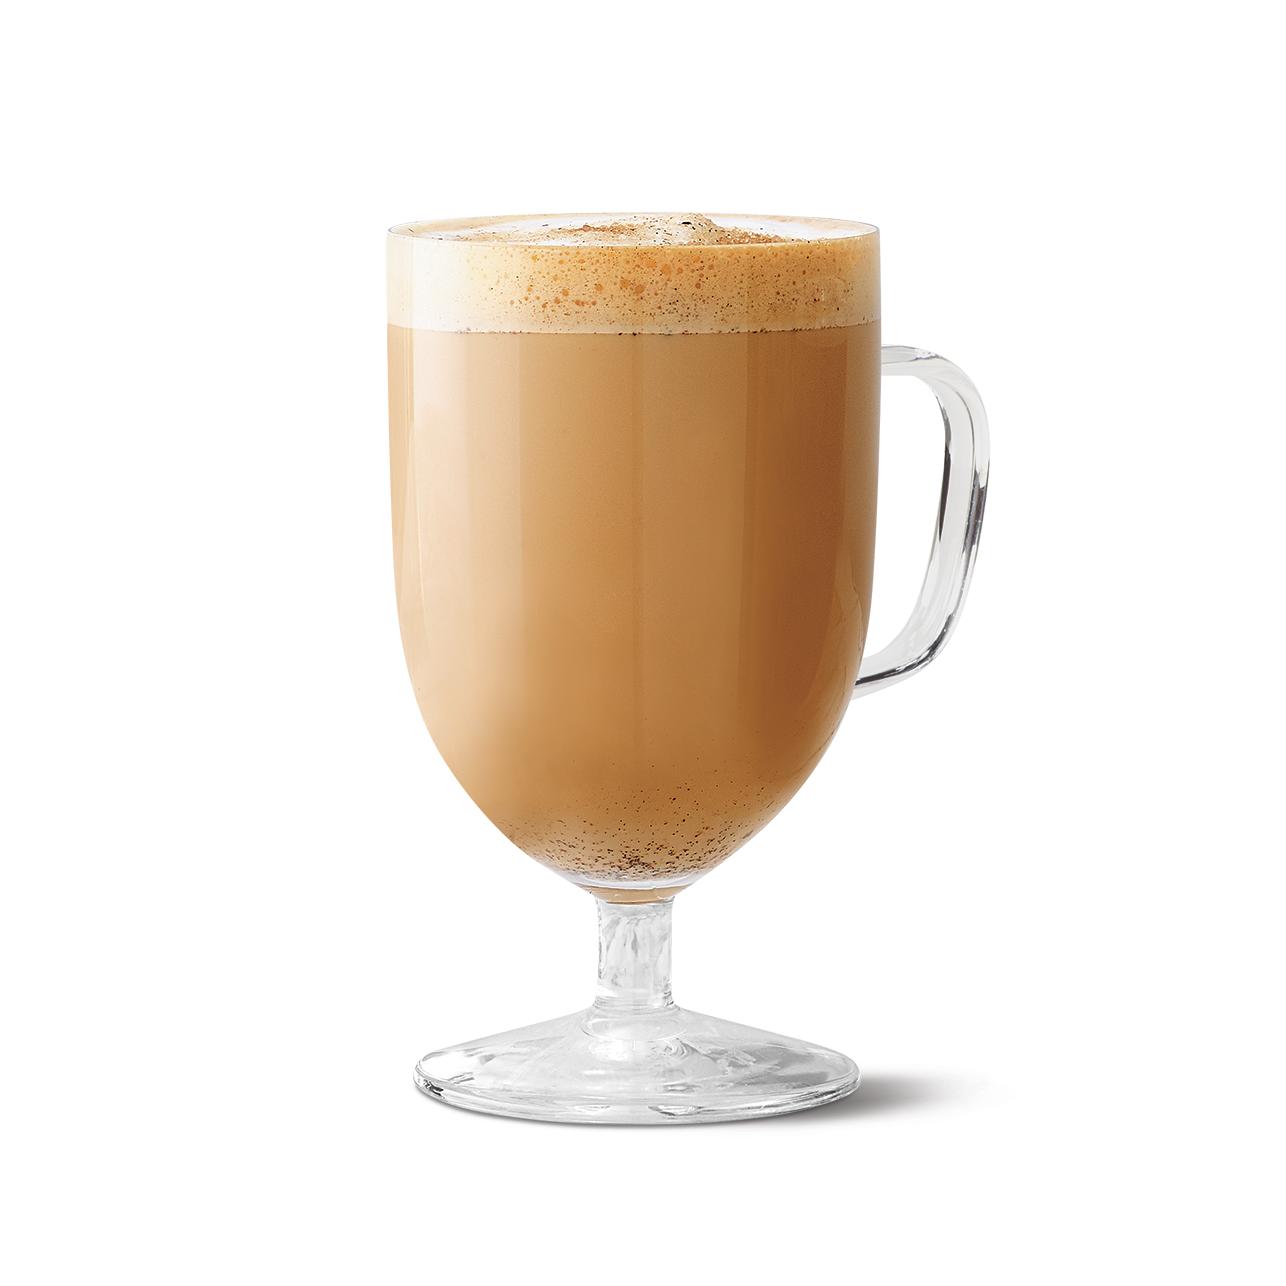 Starbucks Cardamom Latte